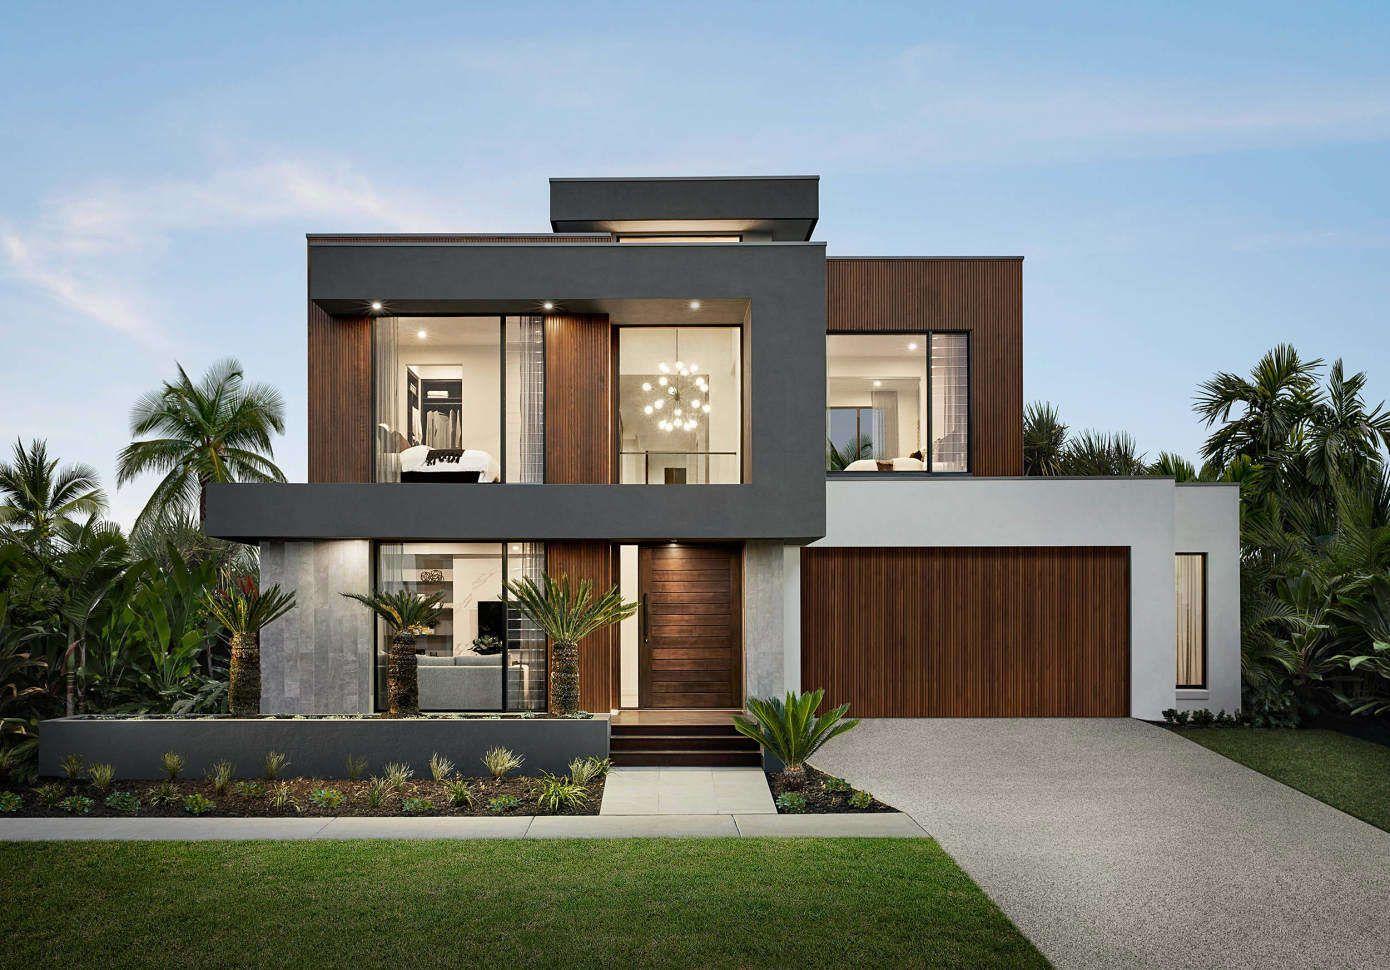 Real Estate - ABG Australia